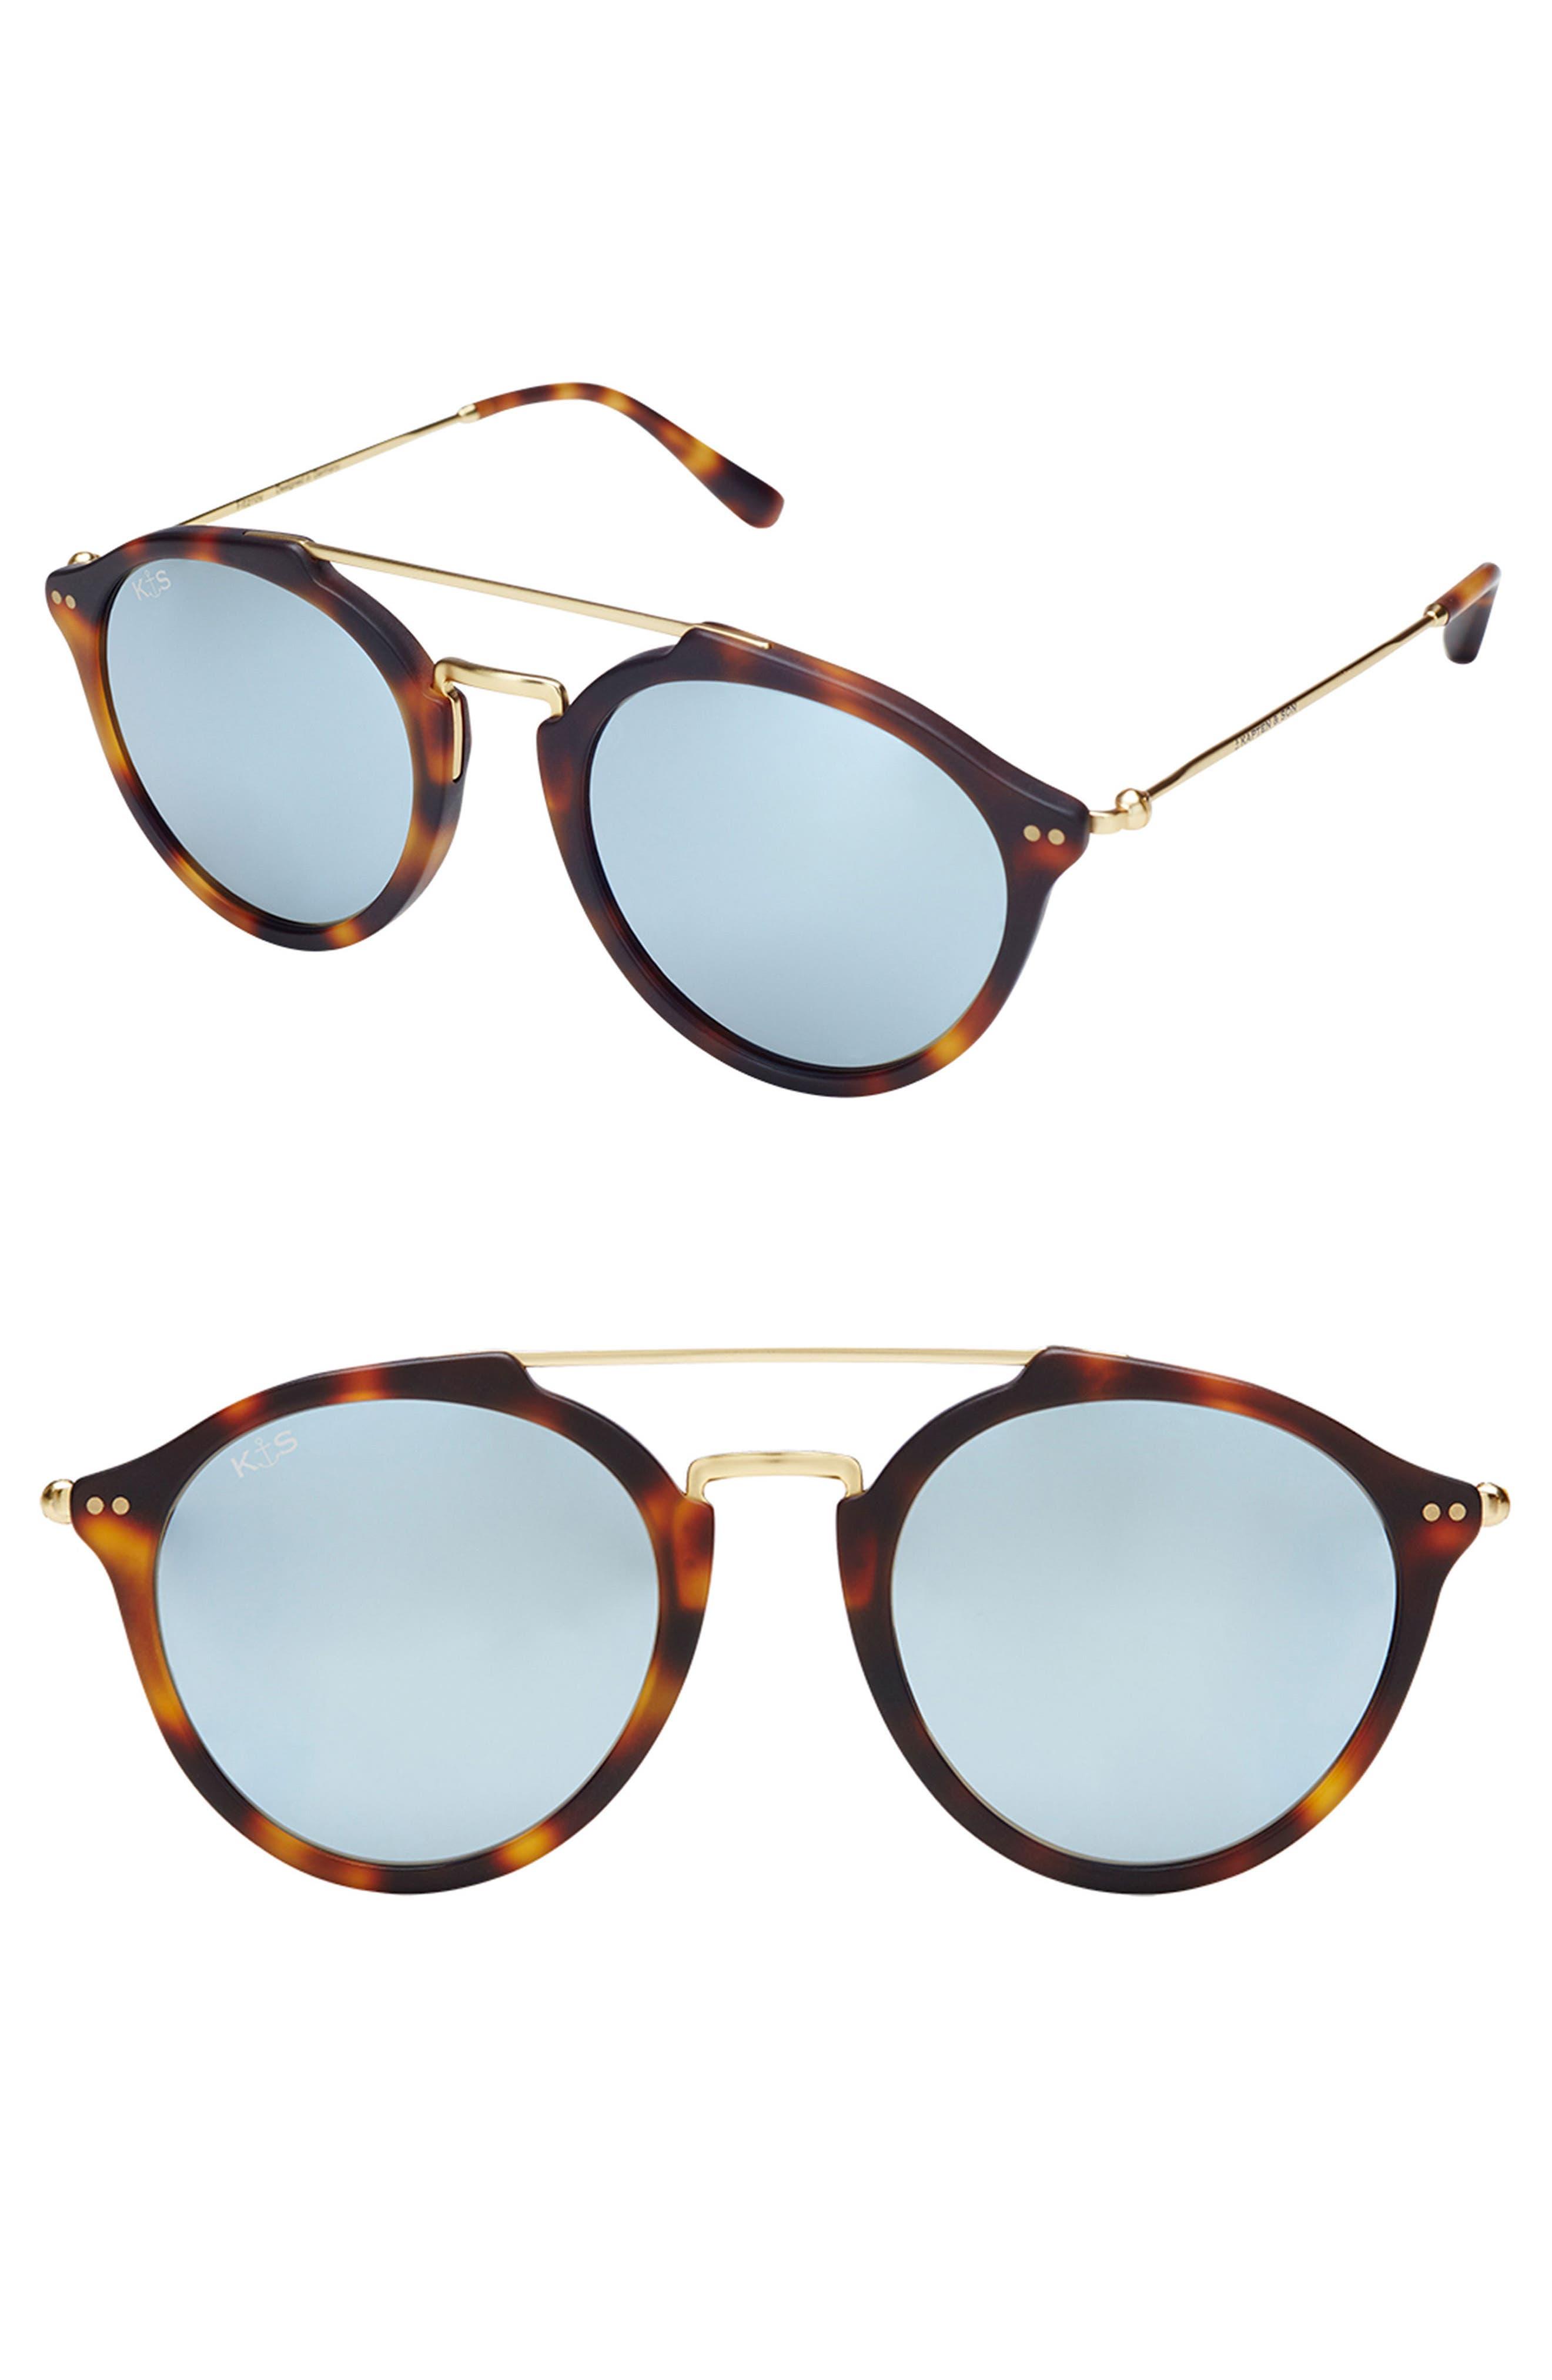 Main Image - Kapten & Son Fitzroy 48mm Sunglasses